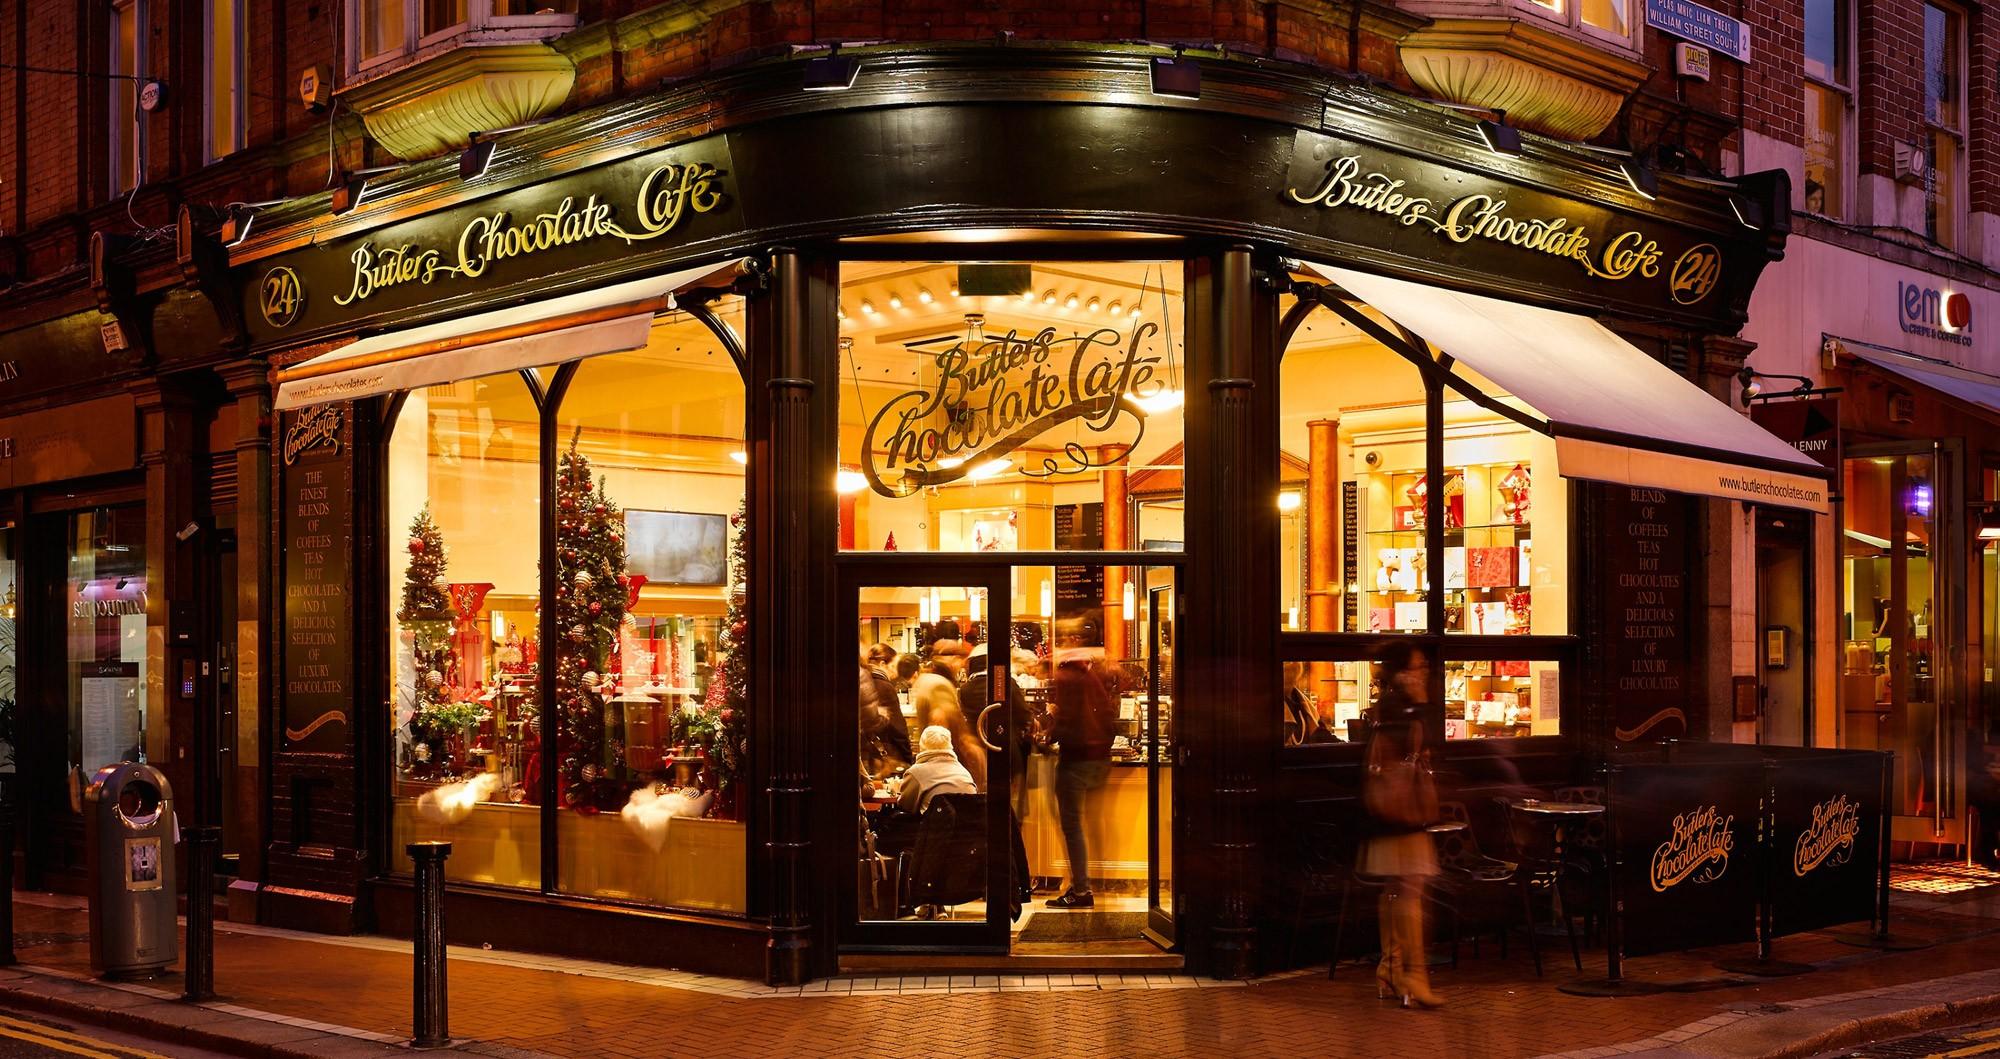 Butlers Chocolate Café, Wicklow Street